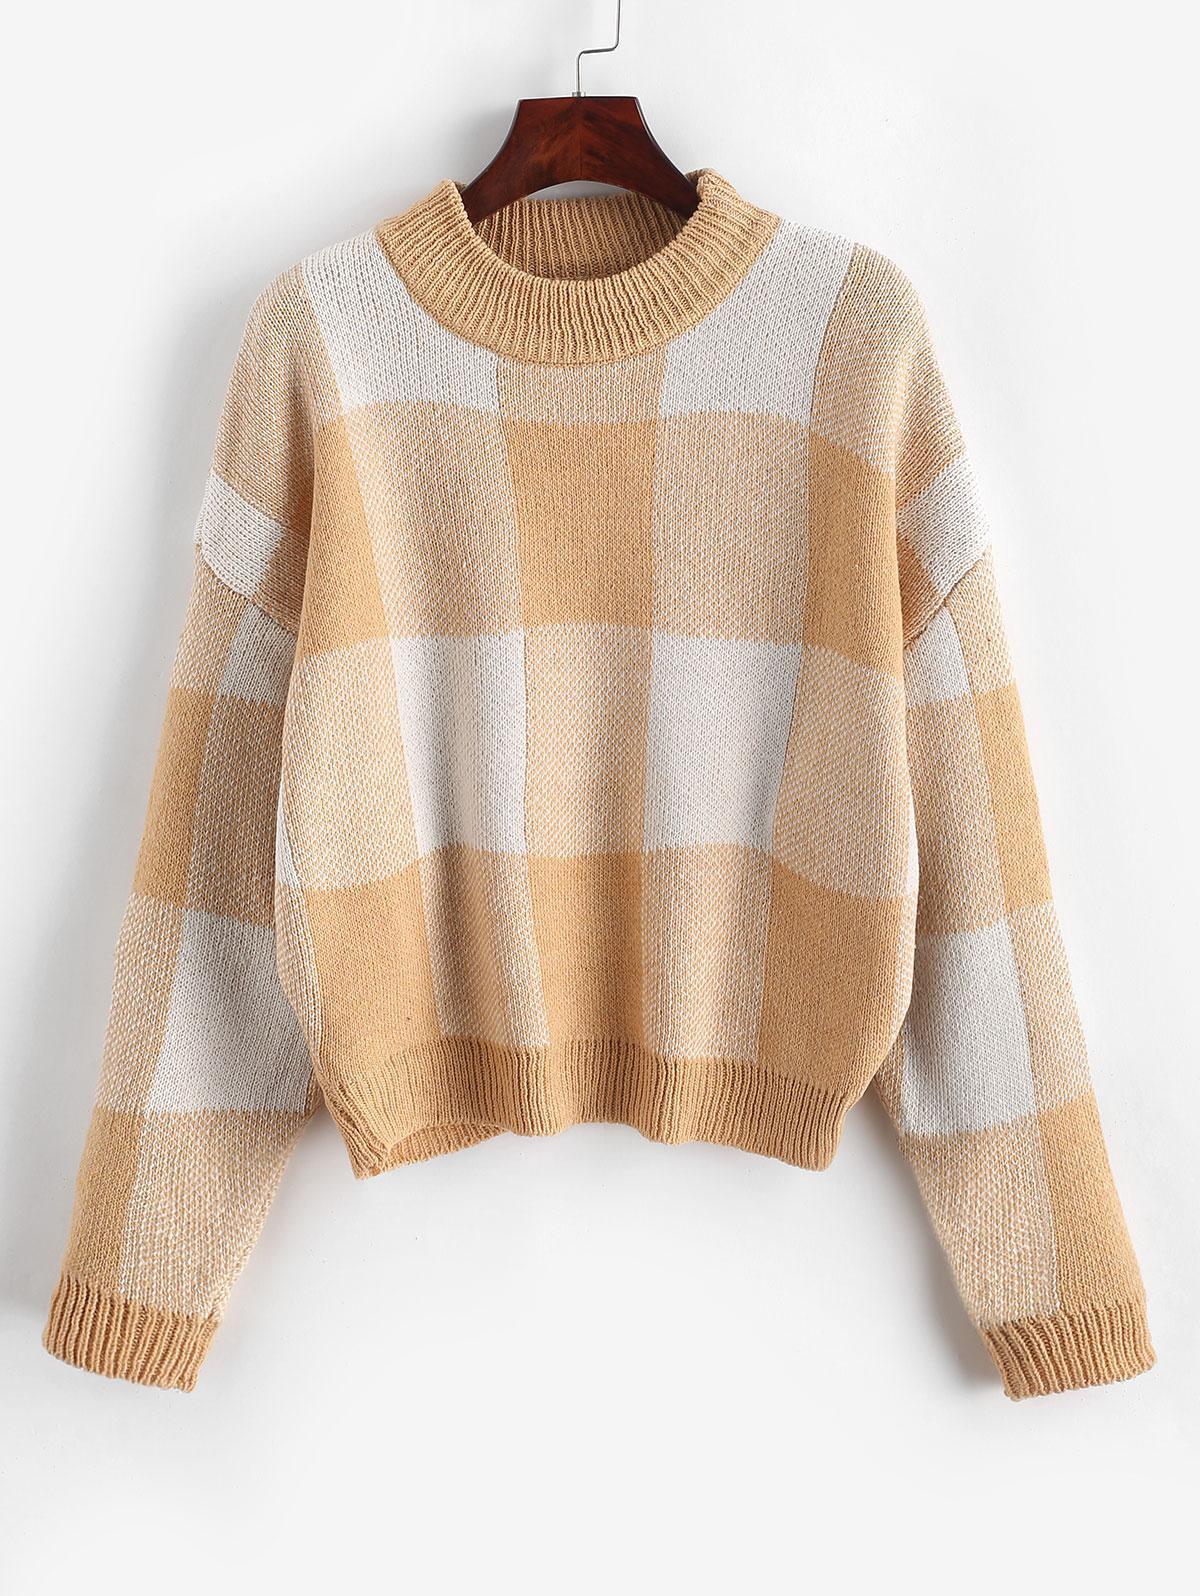 Pullover Intarsia Knit Graphic Crew Neck Sweater